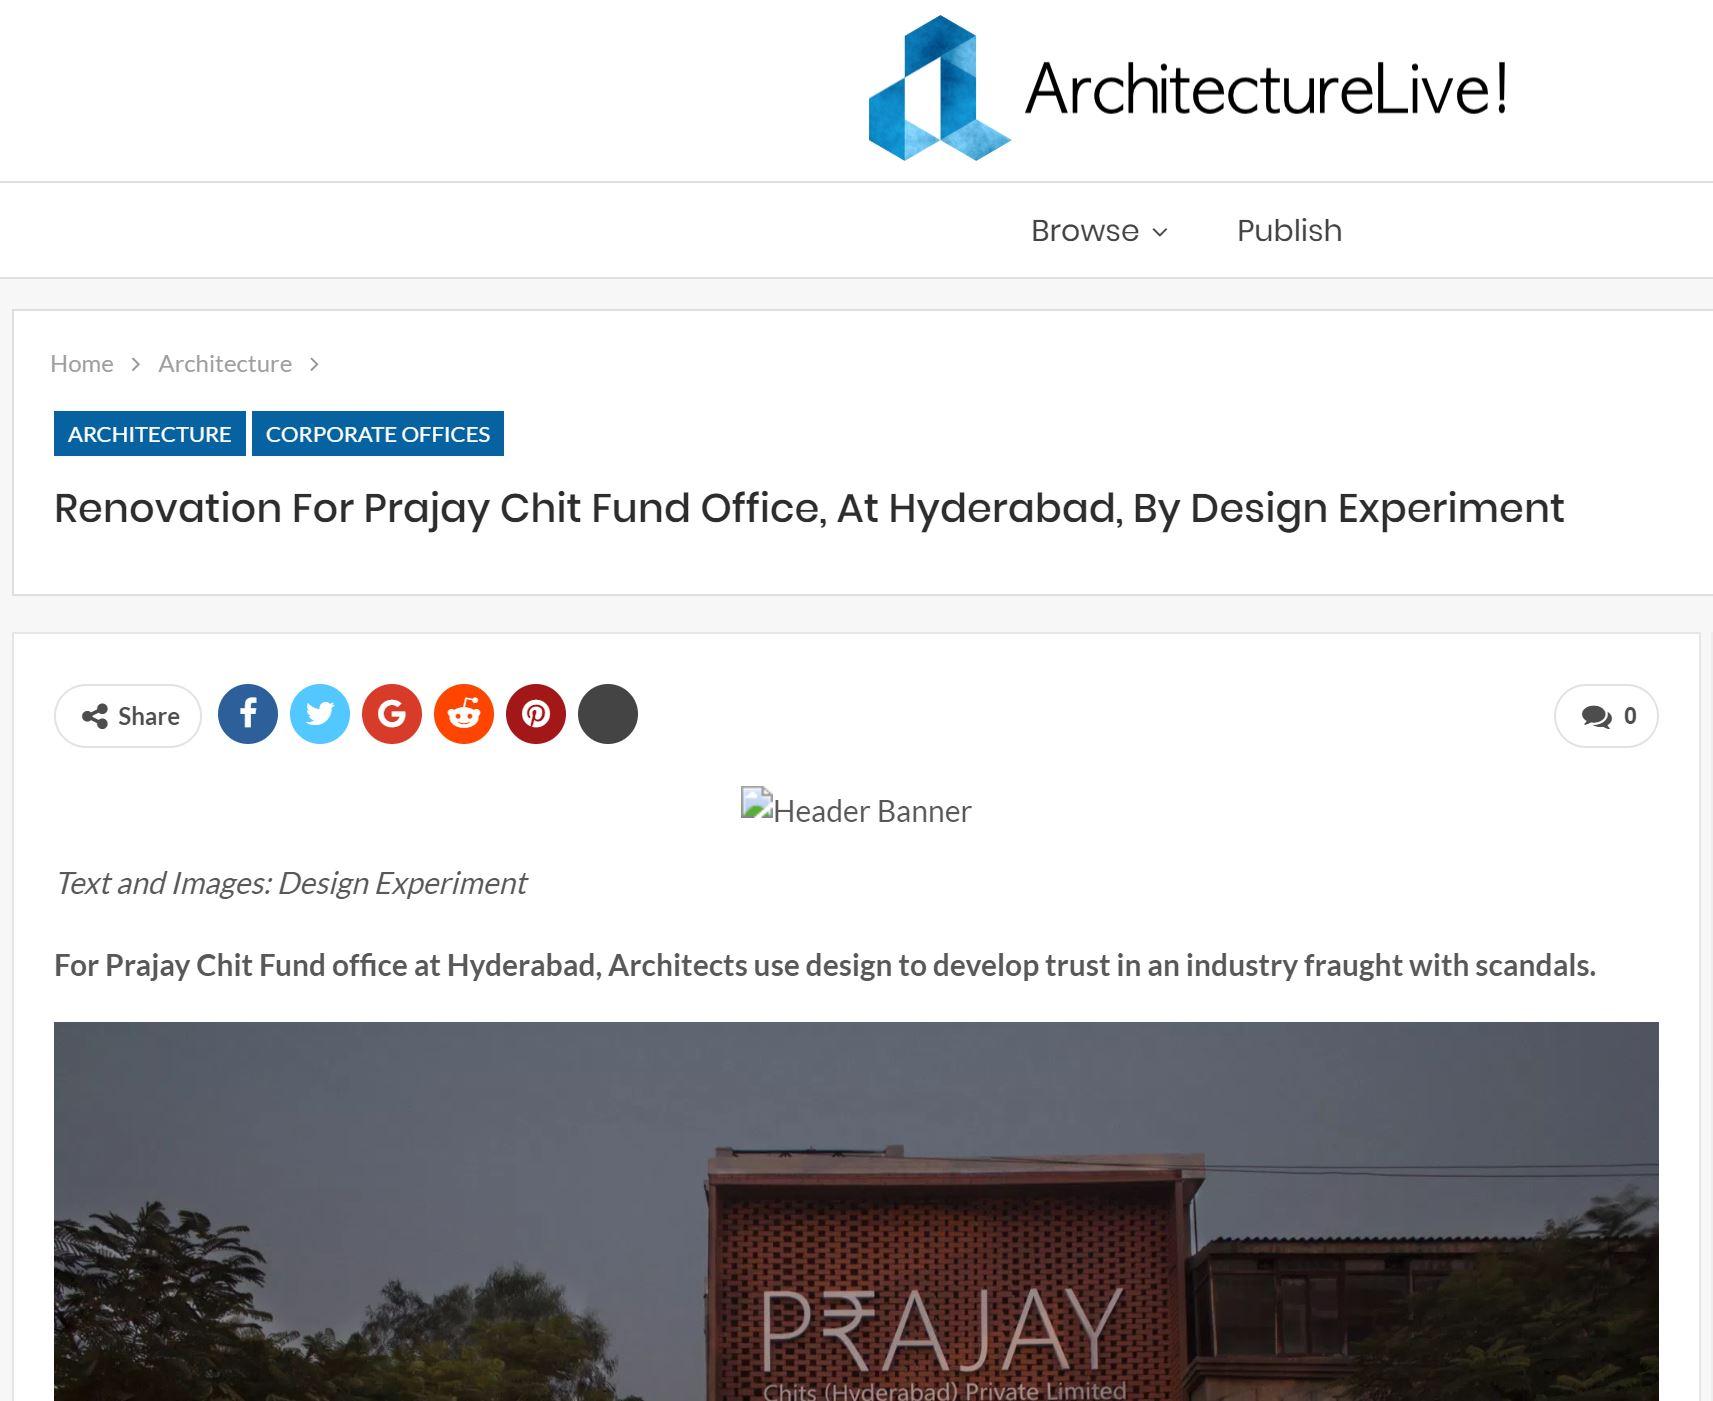 ArchitectureLive! February 2019